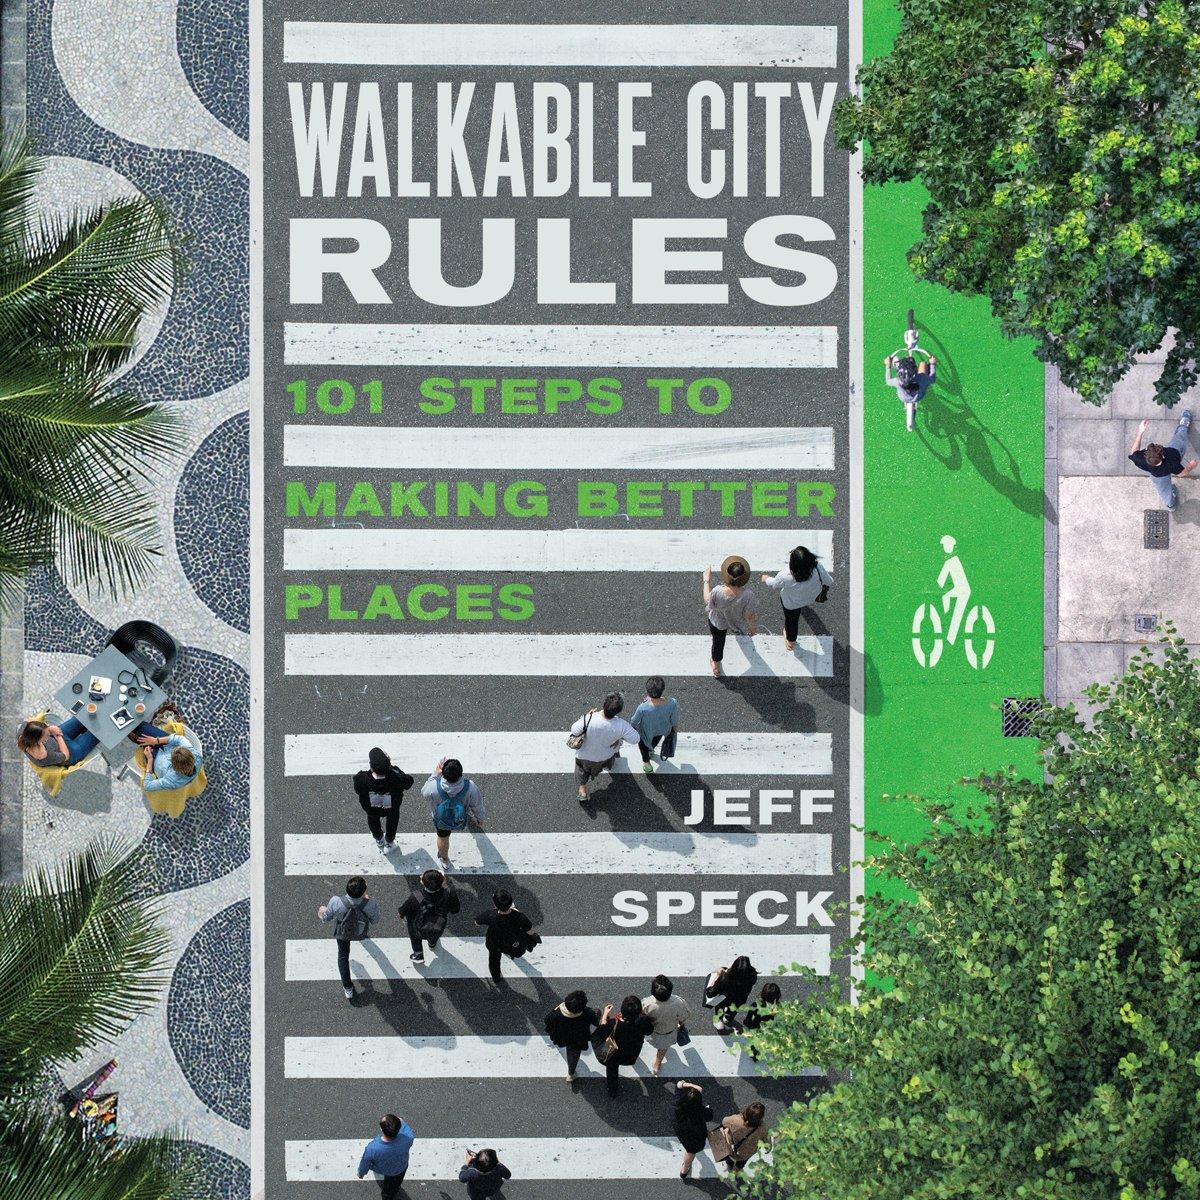 Walkable City Rules - 101 Steps to Making Better Places - De Leesclub van Alles